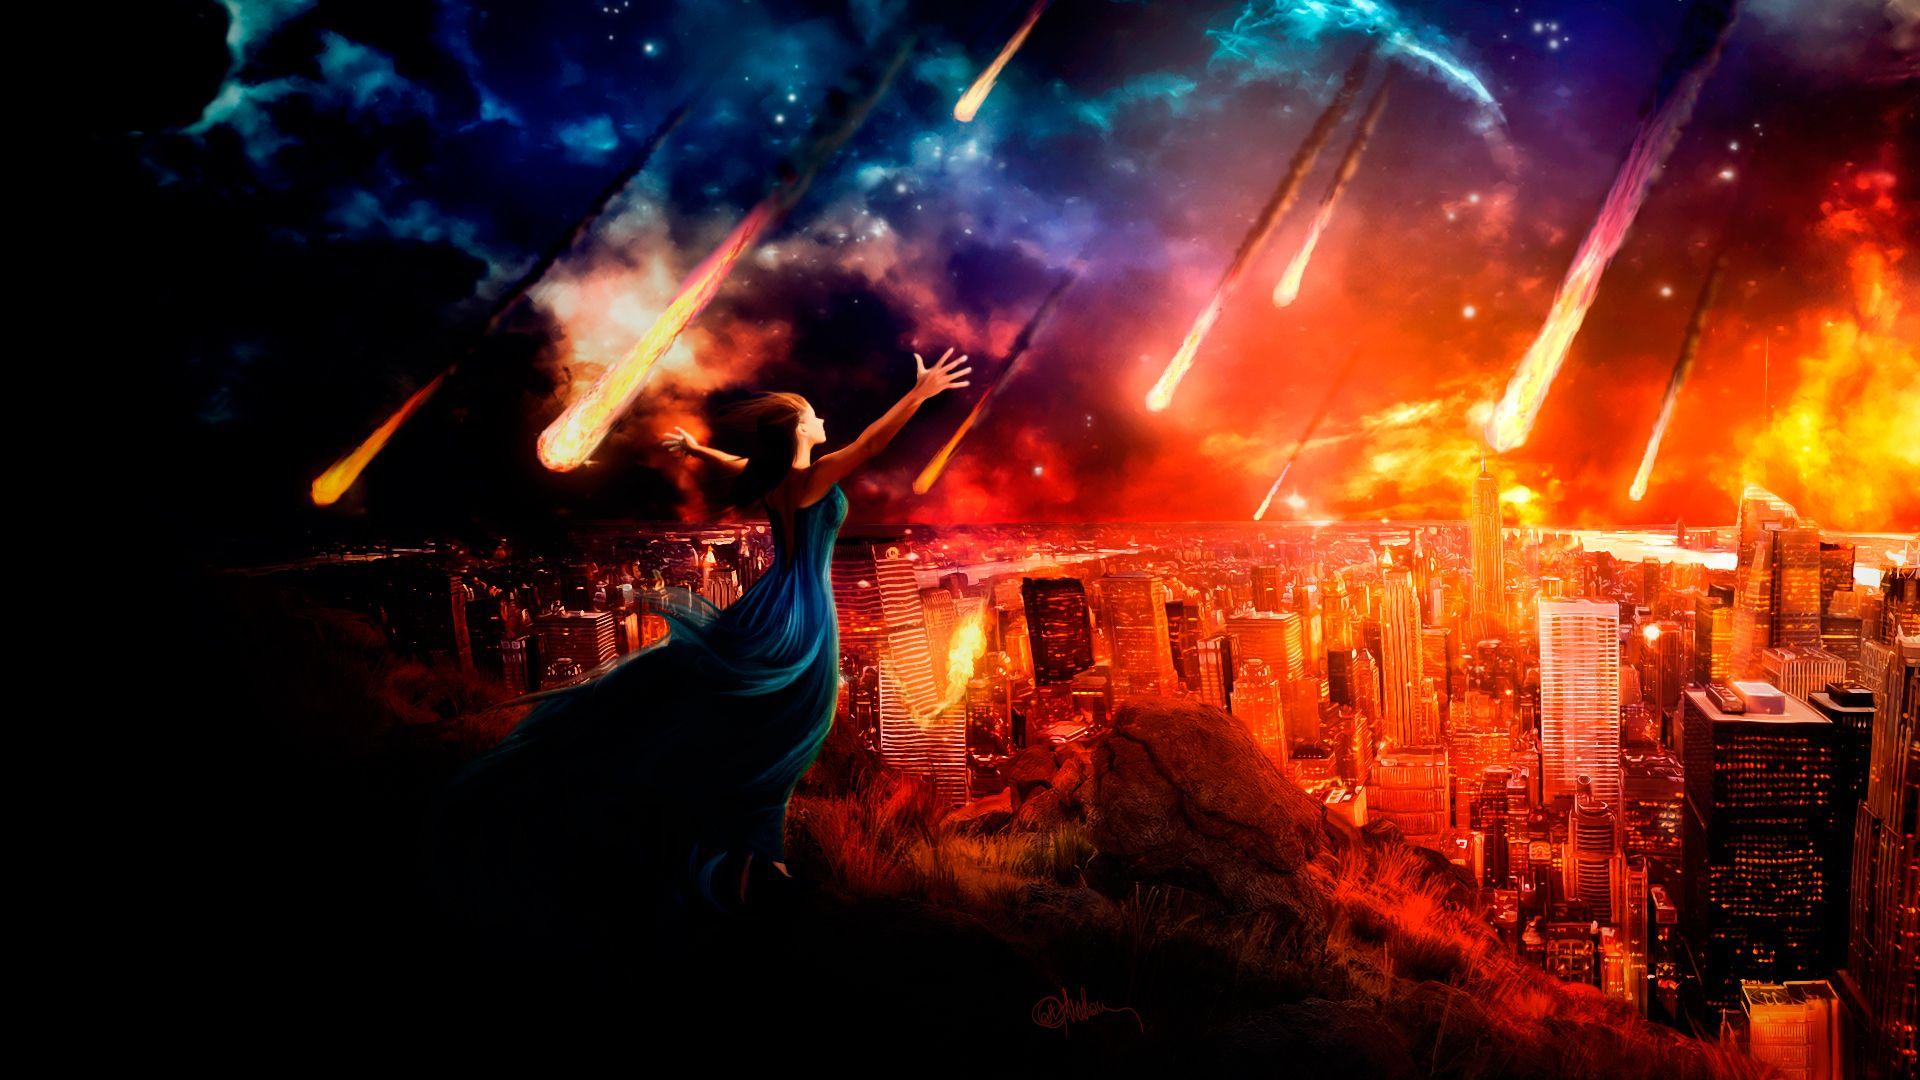 Apocalypse by  Serge Narcissoff